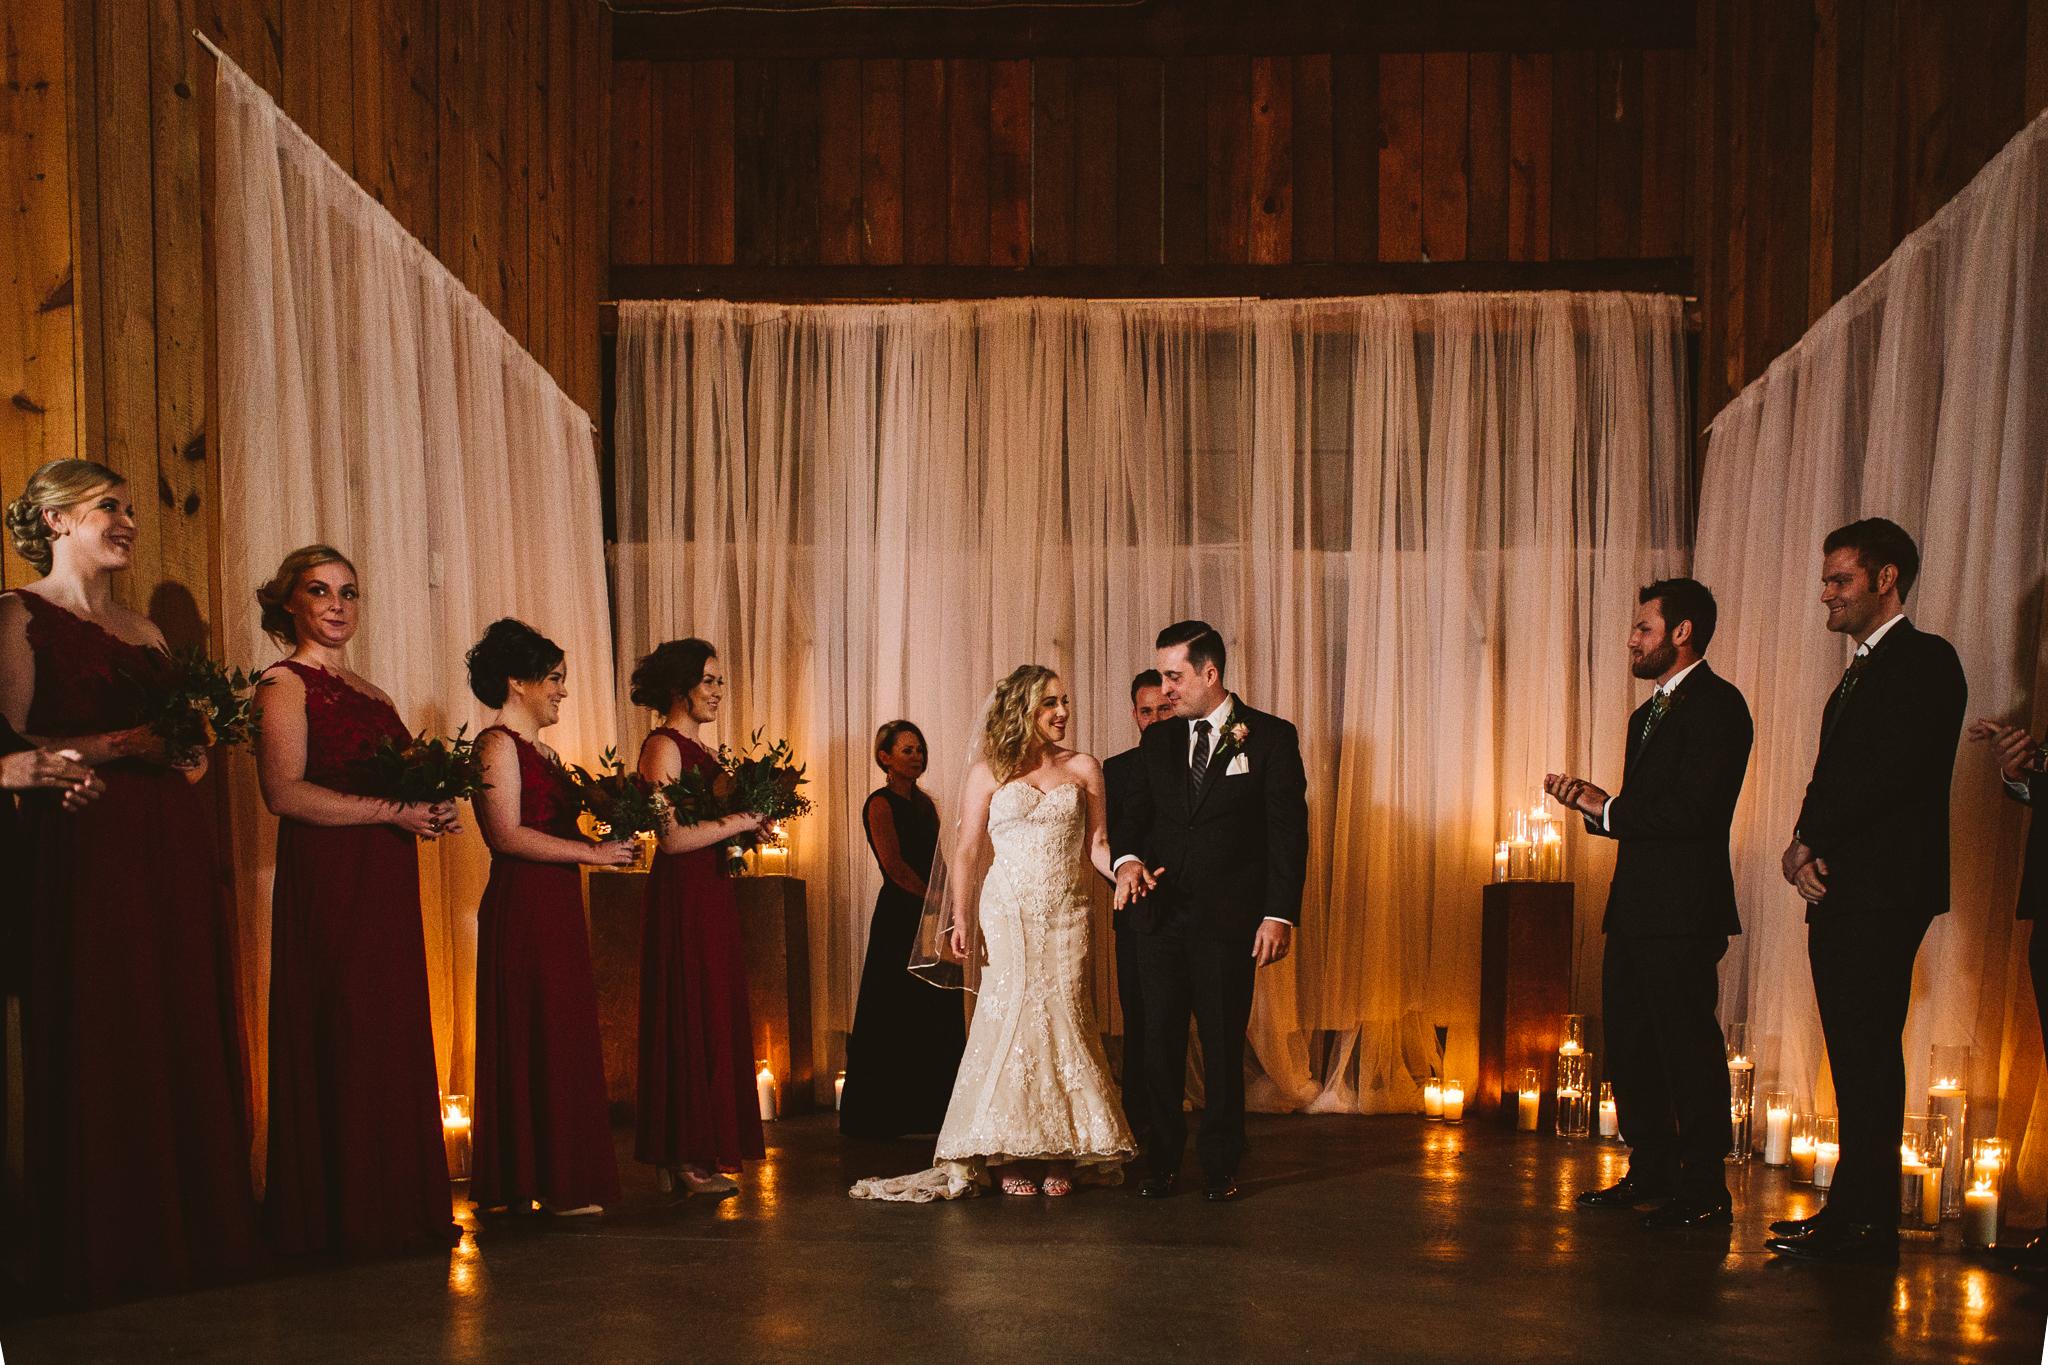 0125 Ariana Jordan Photo - Cameron & Lauren's Wedding at Talon Winery  9170.jpg